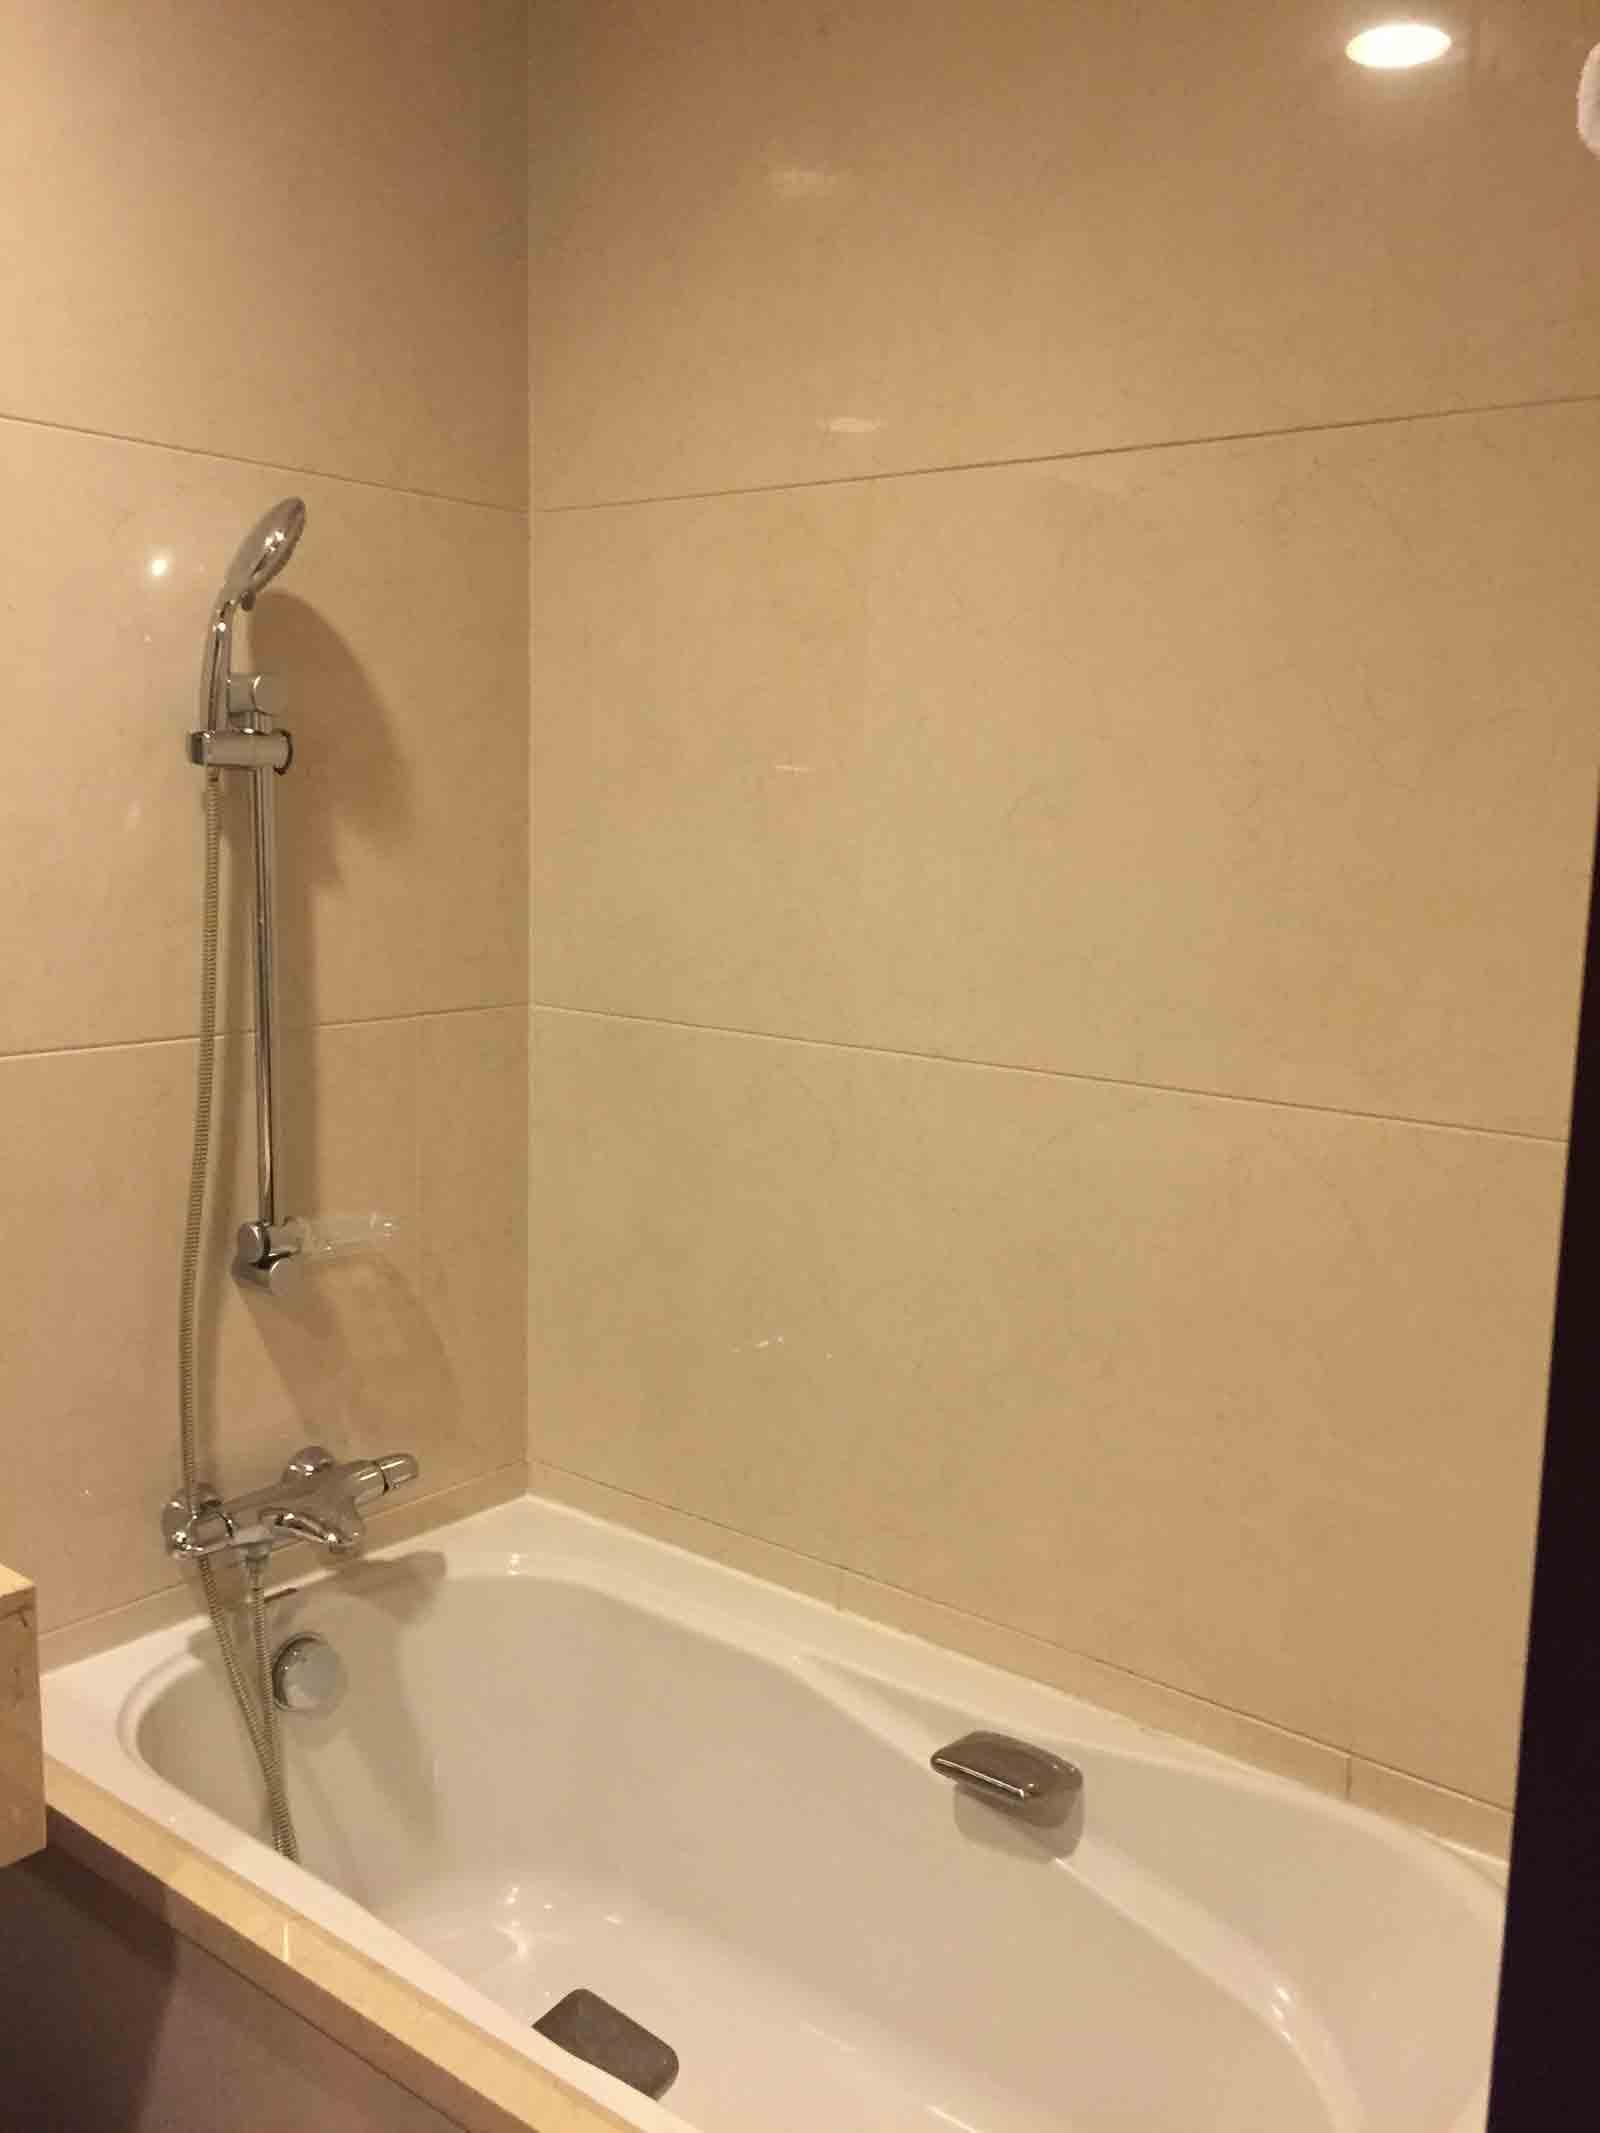 Broadway Macau Broadway King bathtub